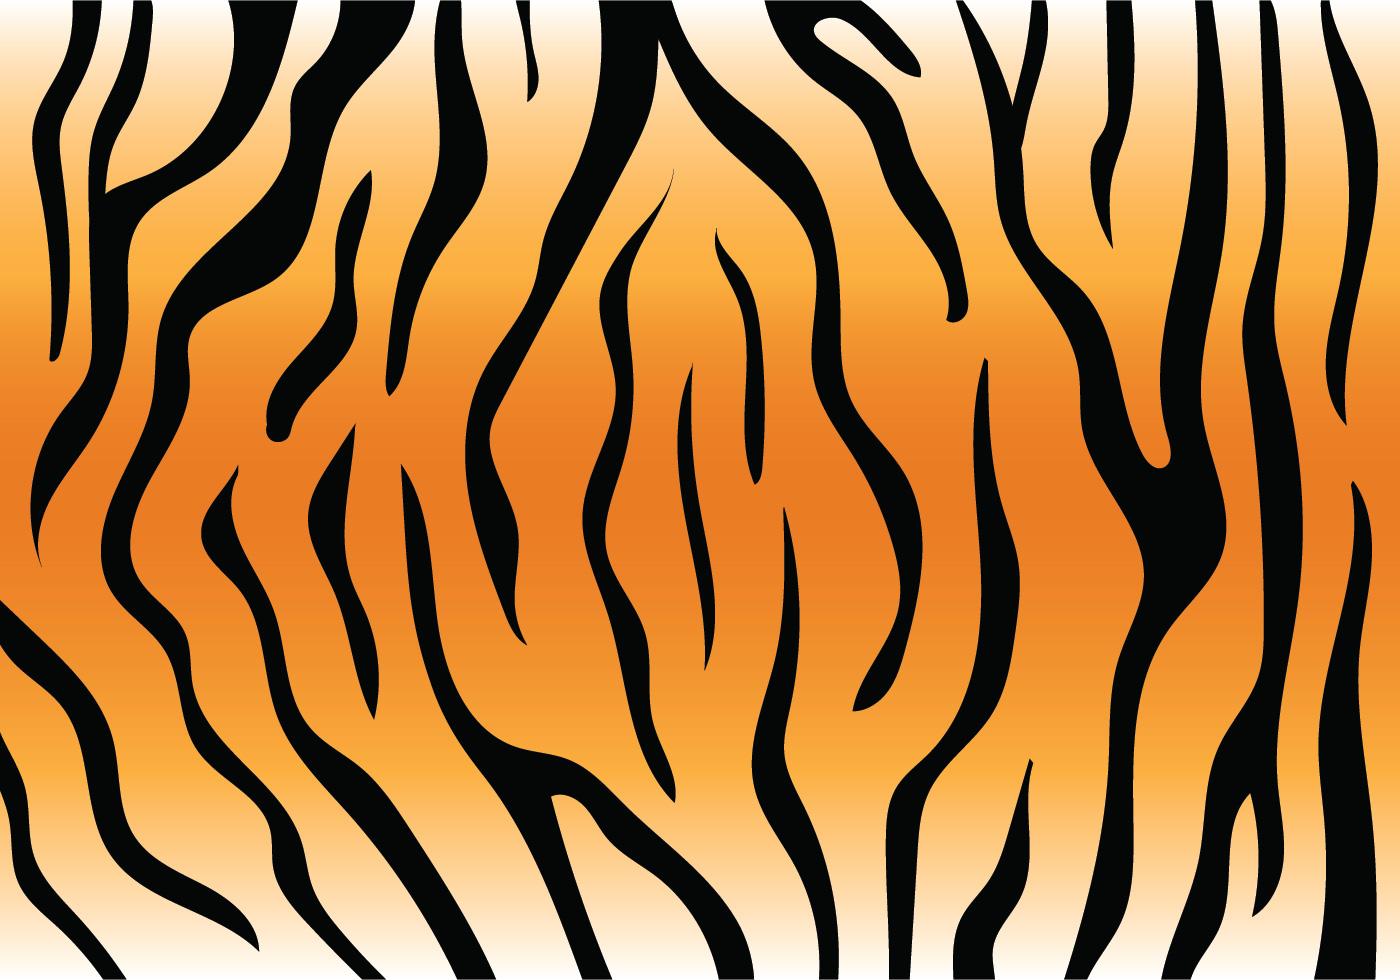 Tiger Stripe Pattern